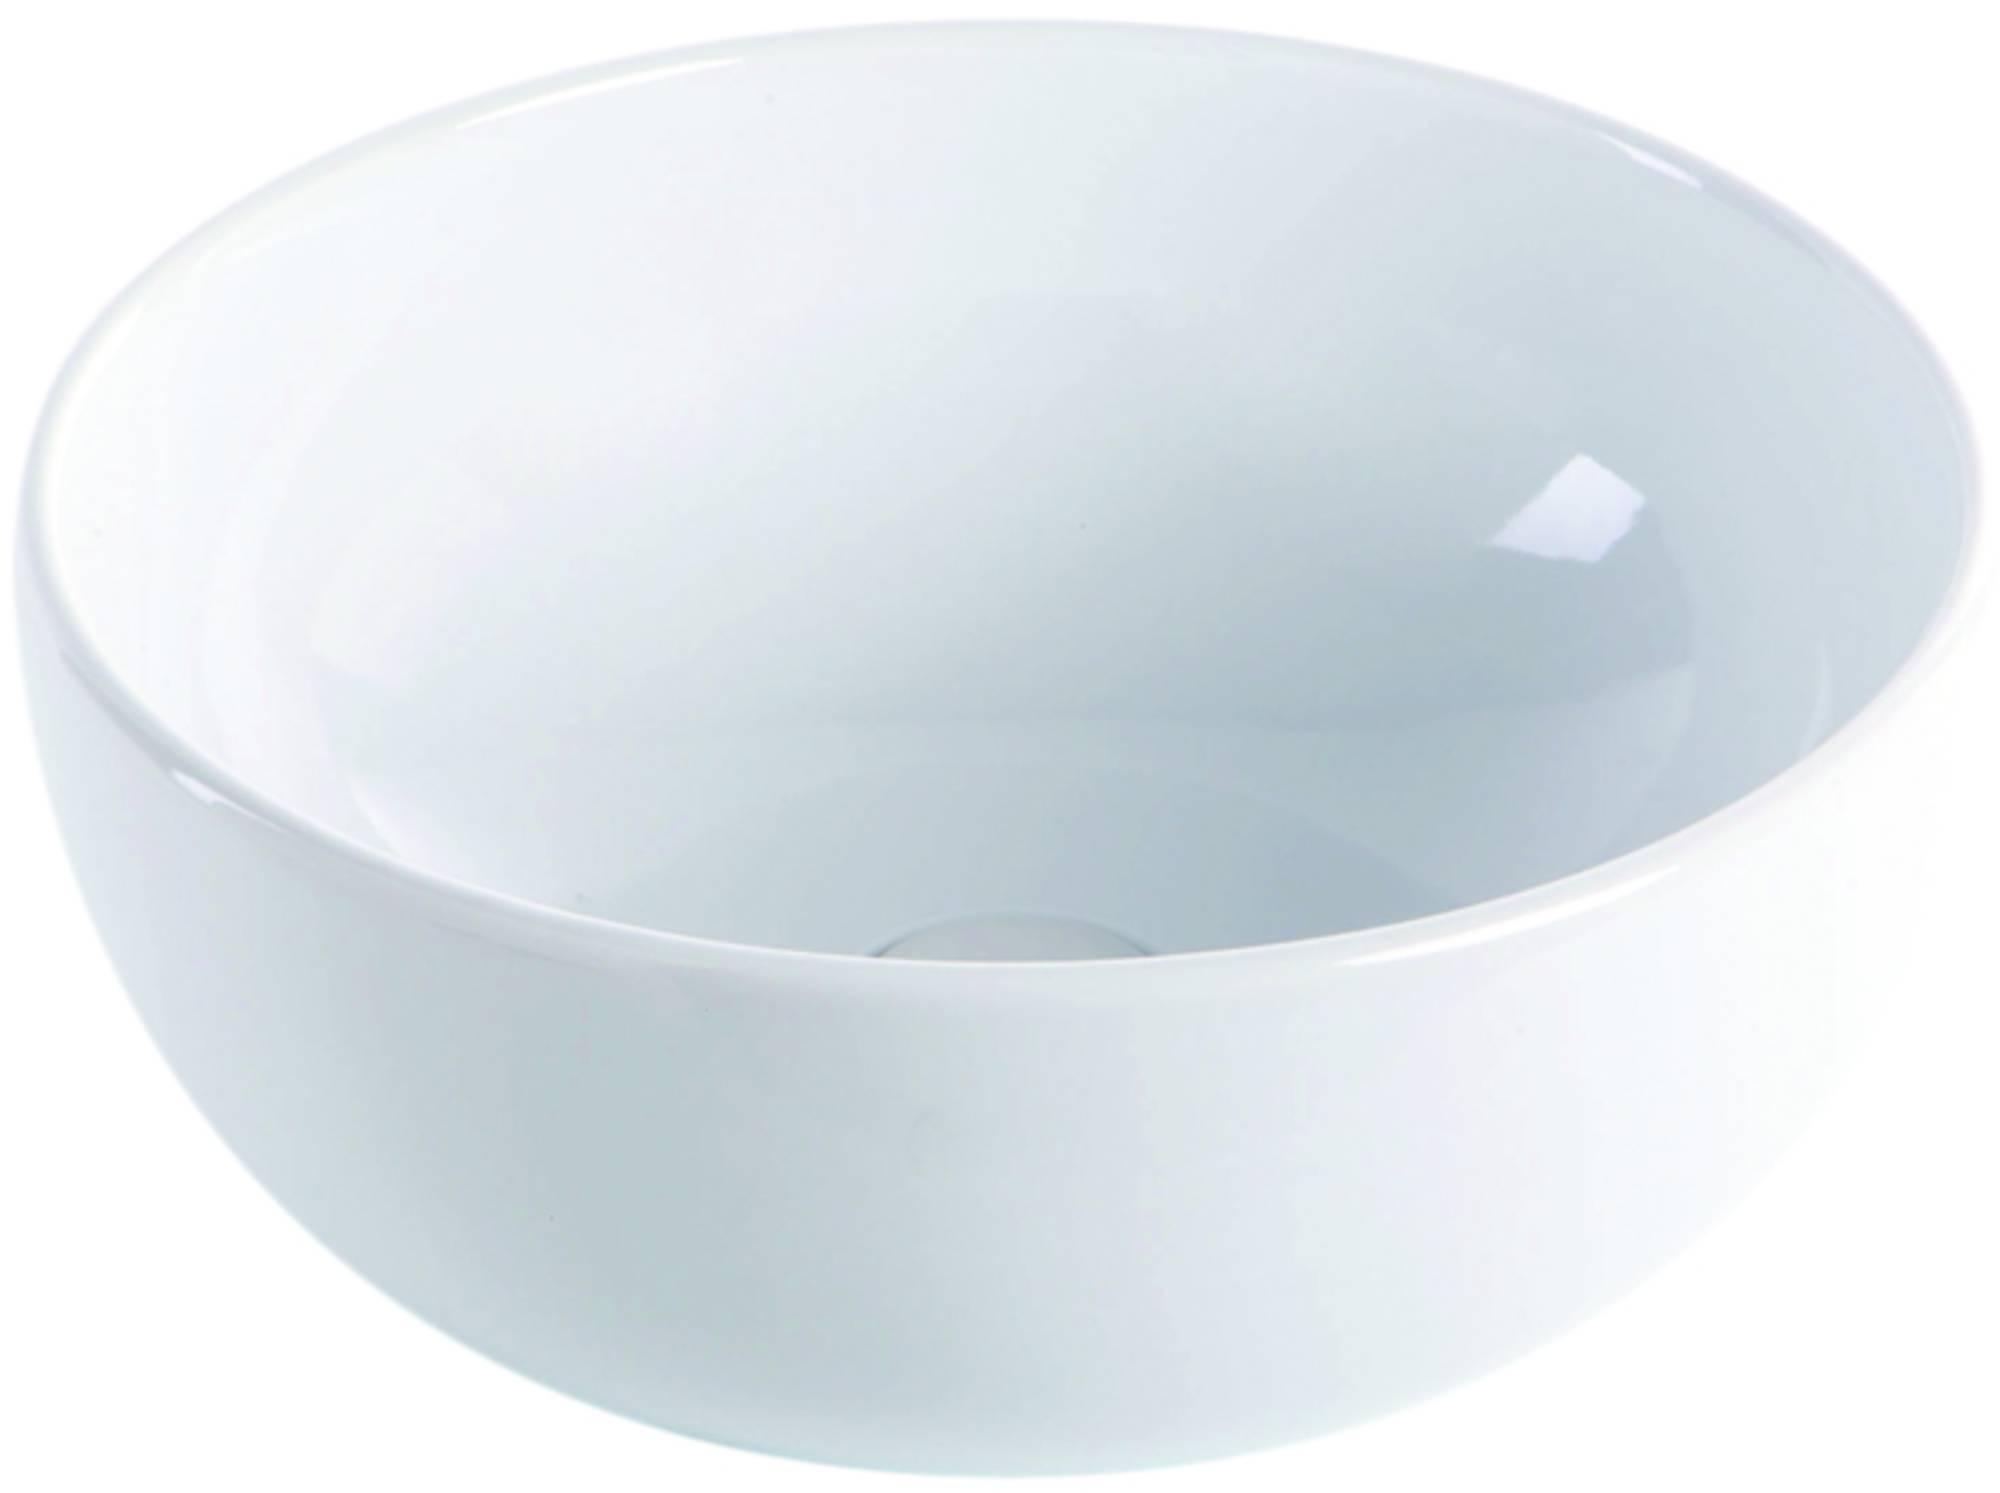 Ceramica Cielo SpA Shui Wastafel Keramiek 40x40 cm Pomice